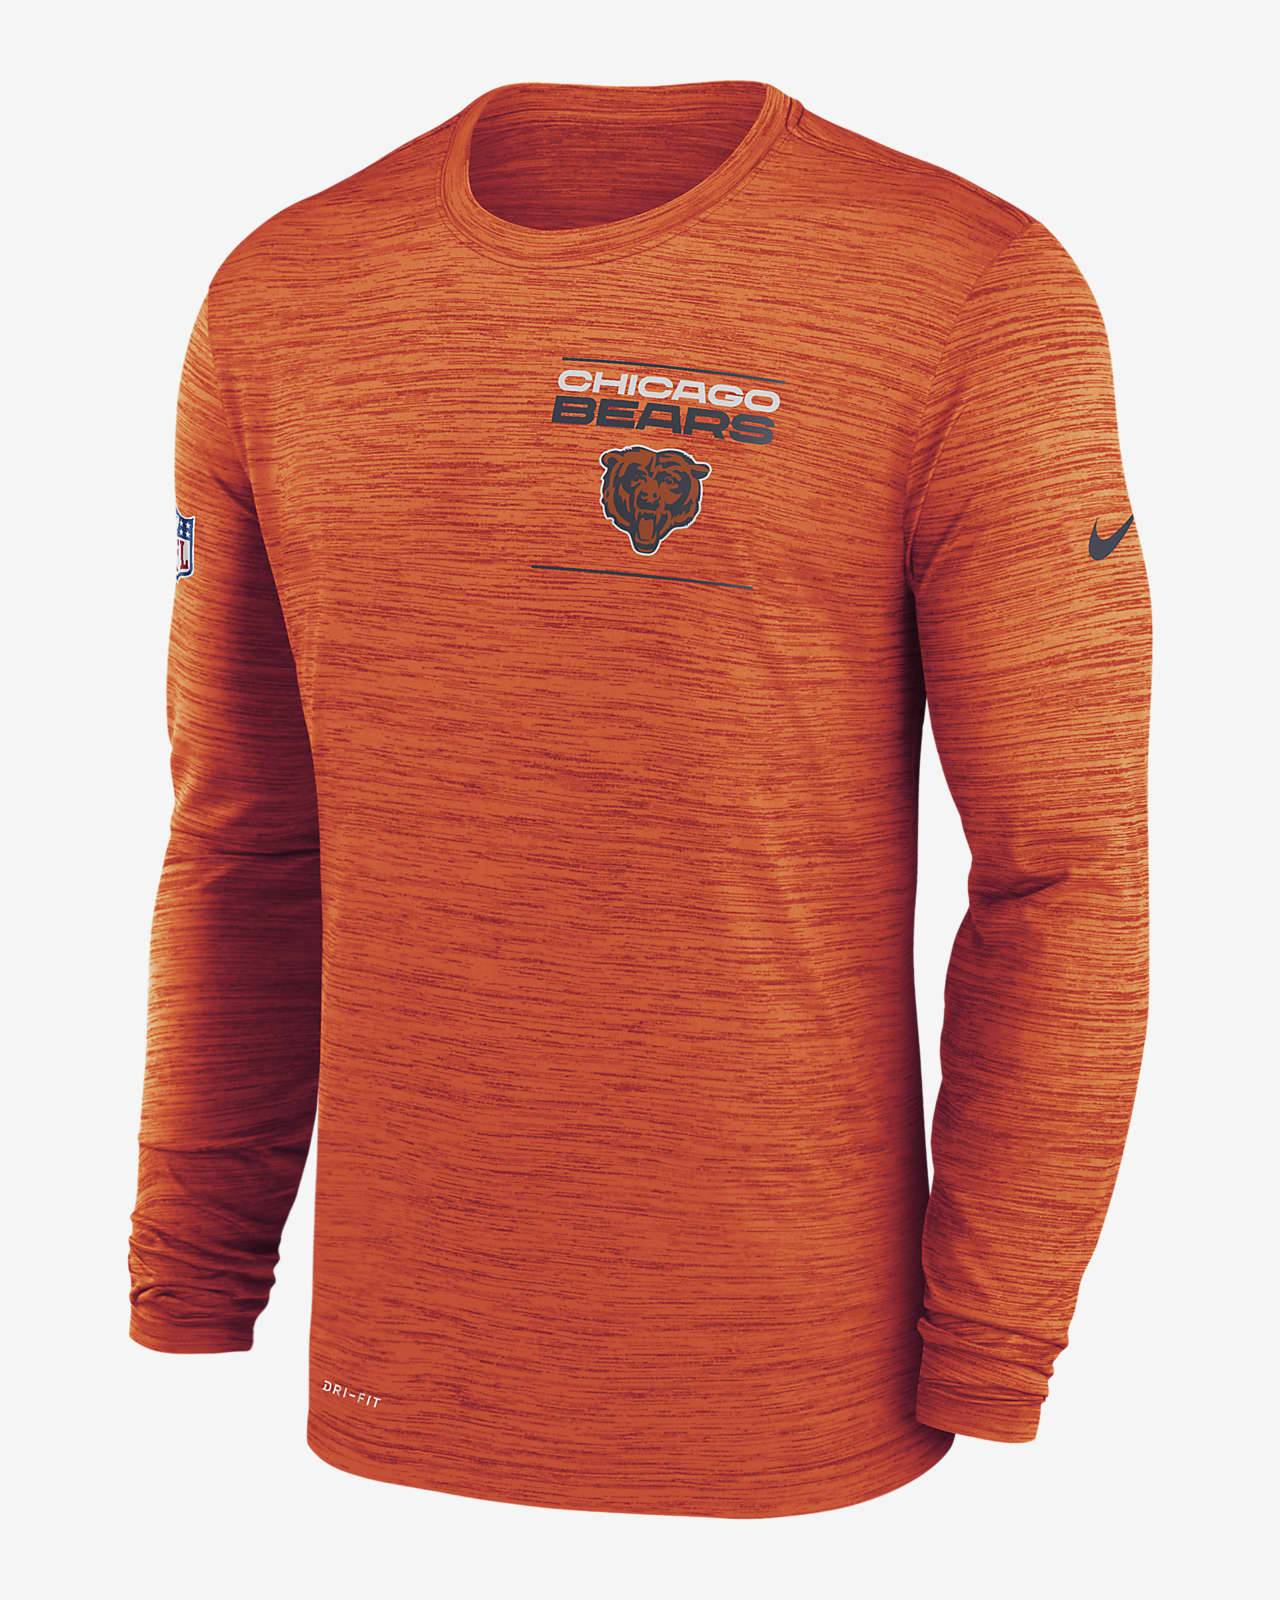 Nike Dri-FIT Sideline Velocity Legend (NFL Chicago Bears) Men's Long-Sleeve T-Shirt